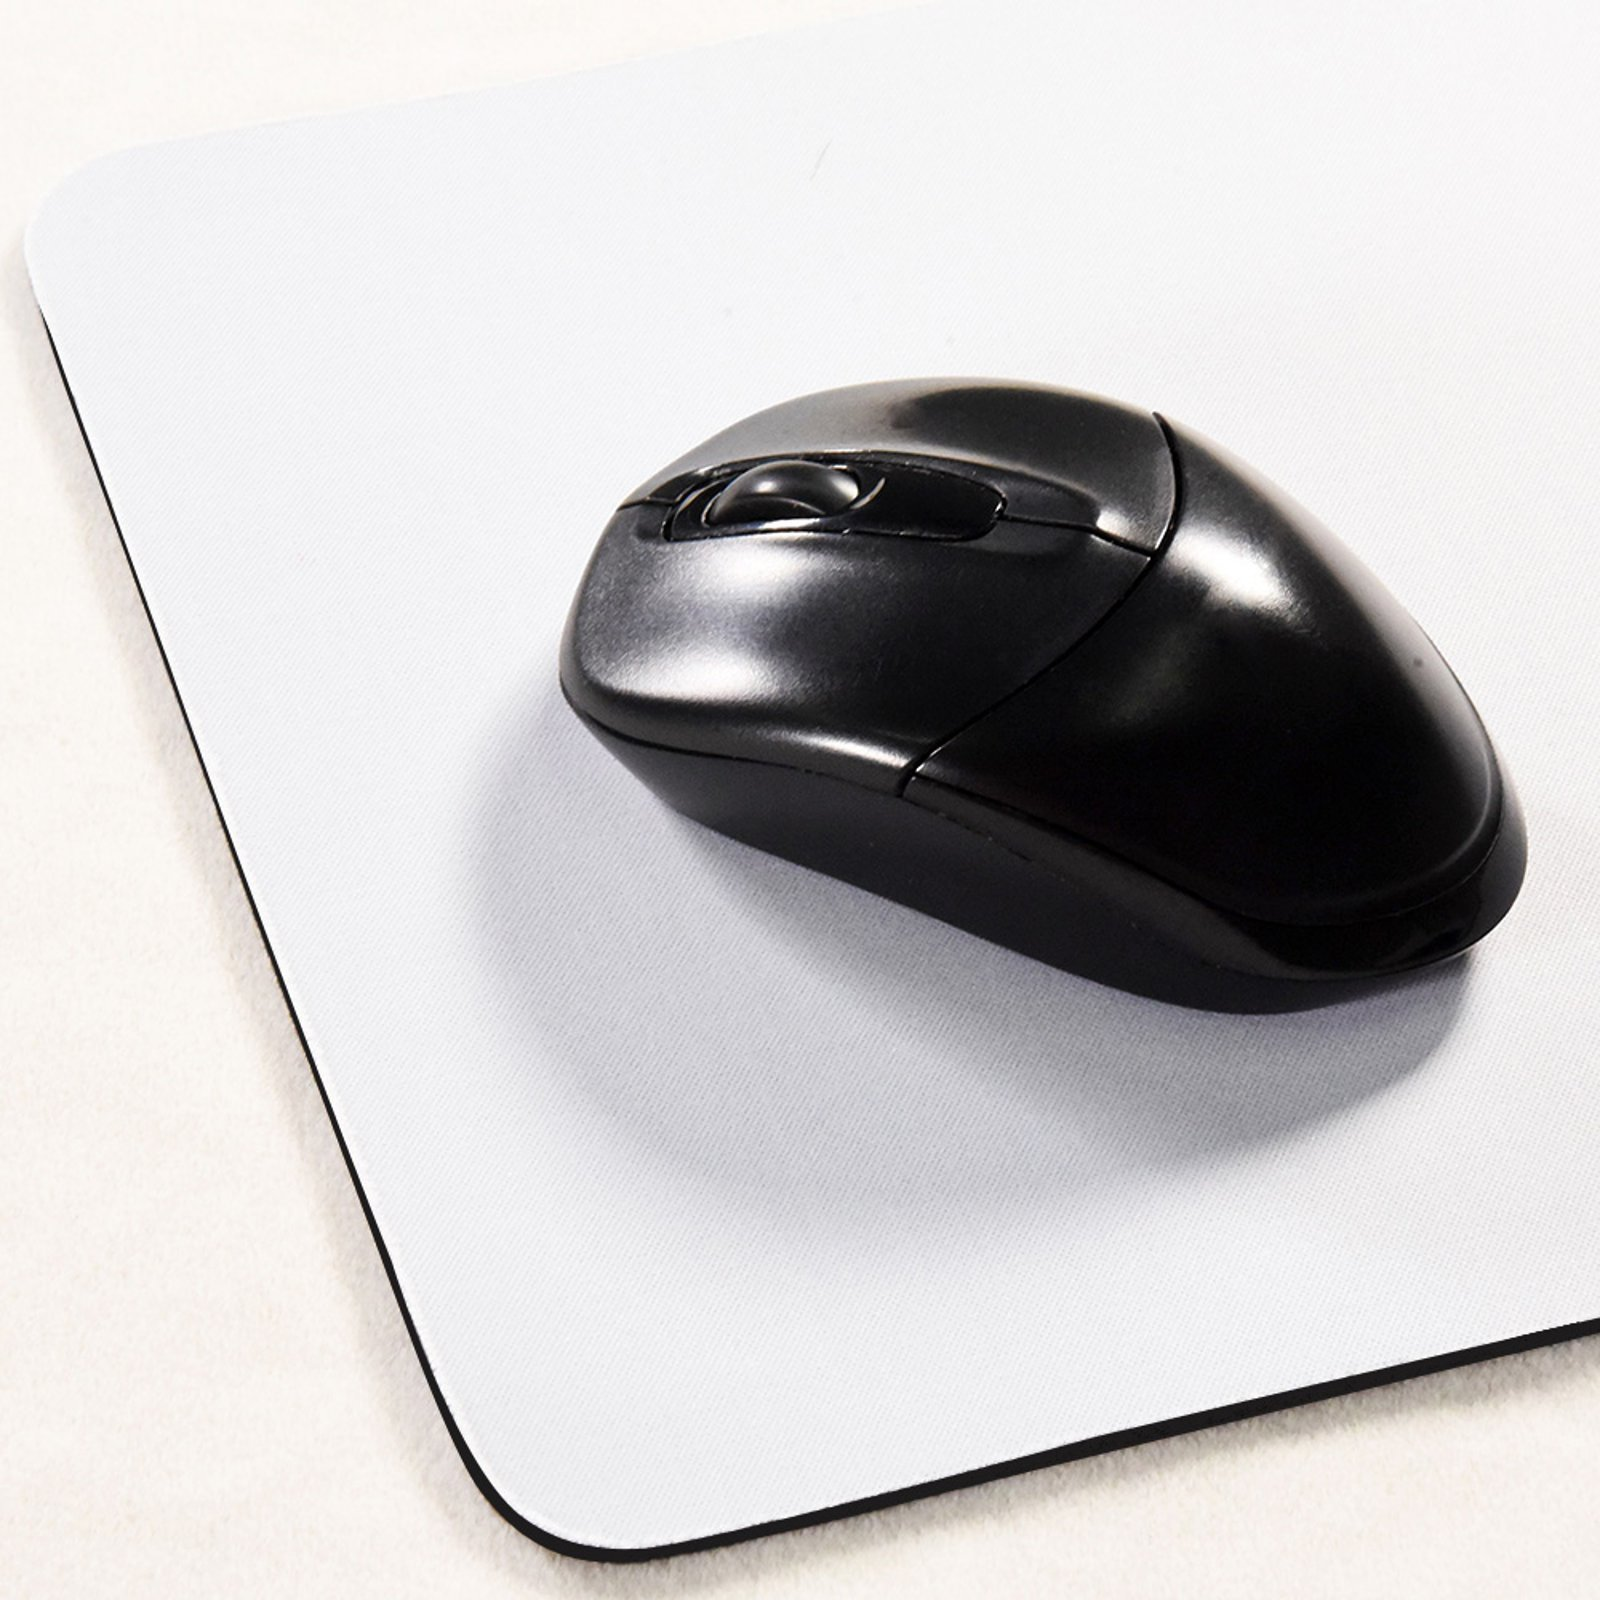 H417551f34c6347f58f0a32cbab91ca14i - Anime Mousepads